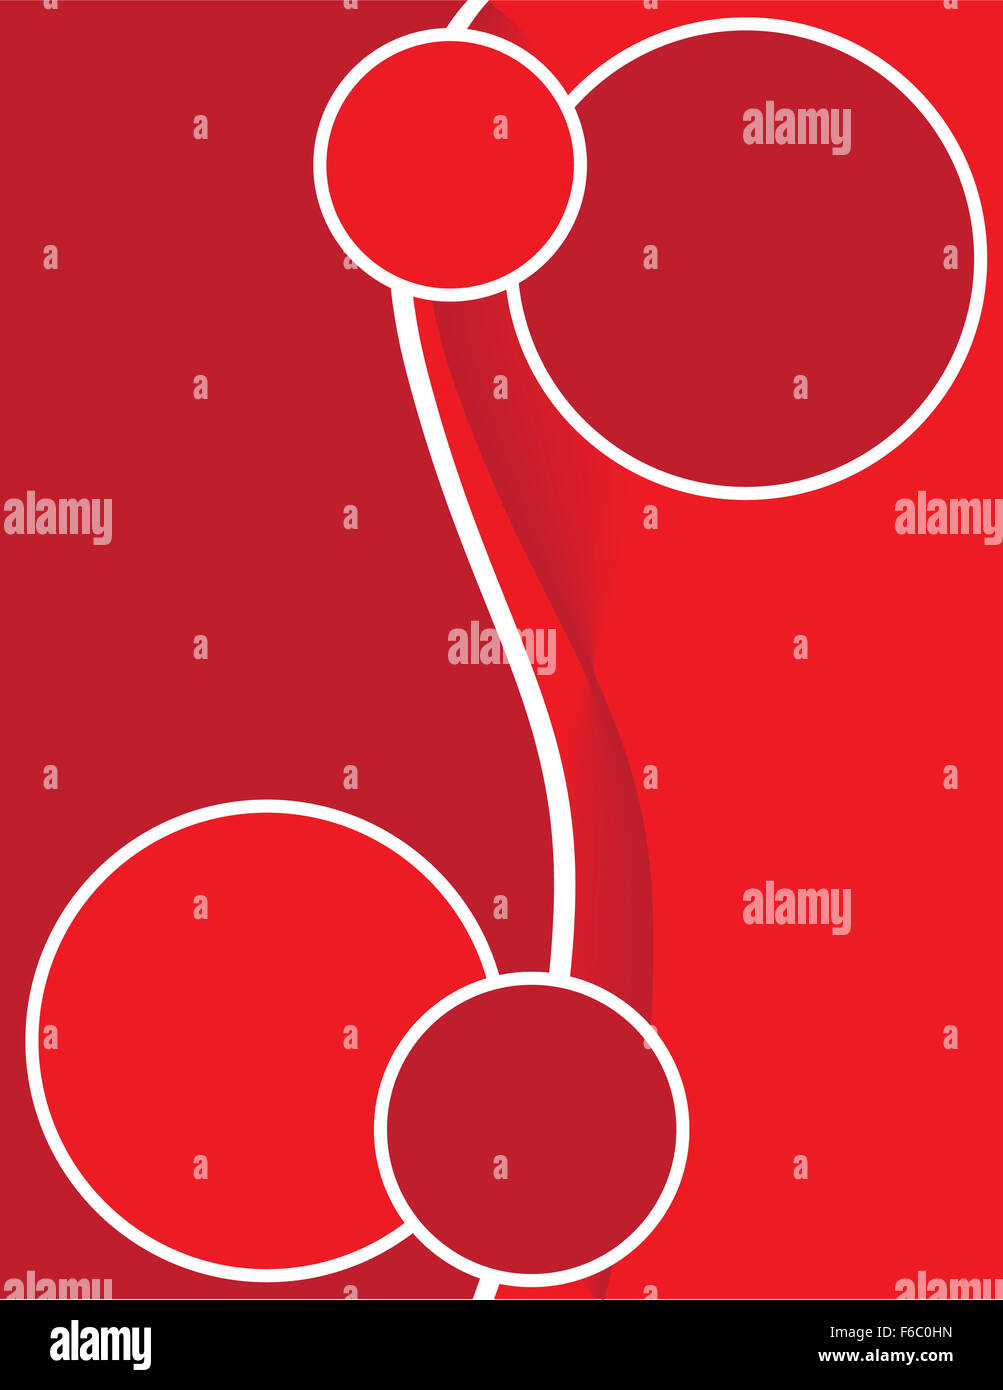 Brochure Background Red Swirls - Stock Image